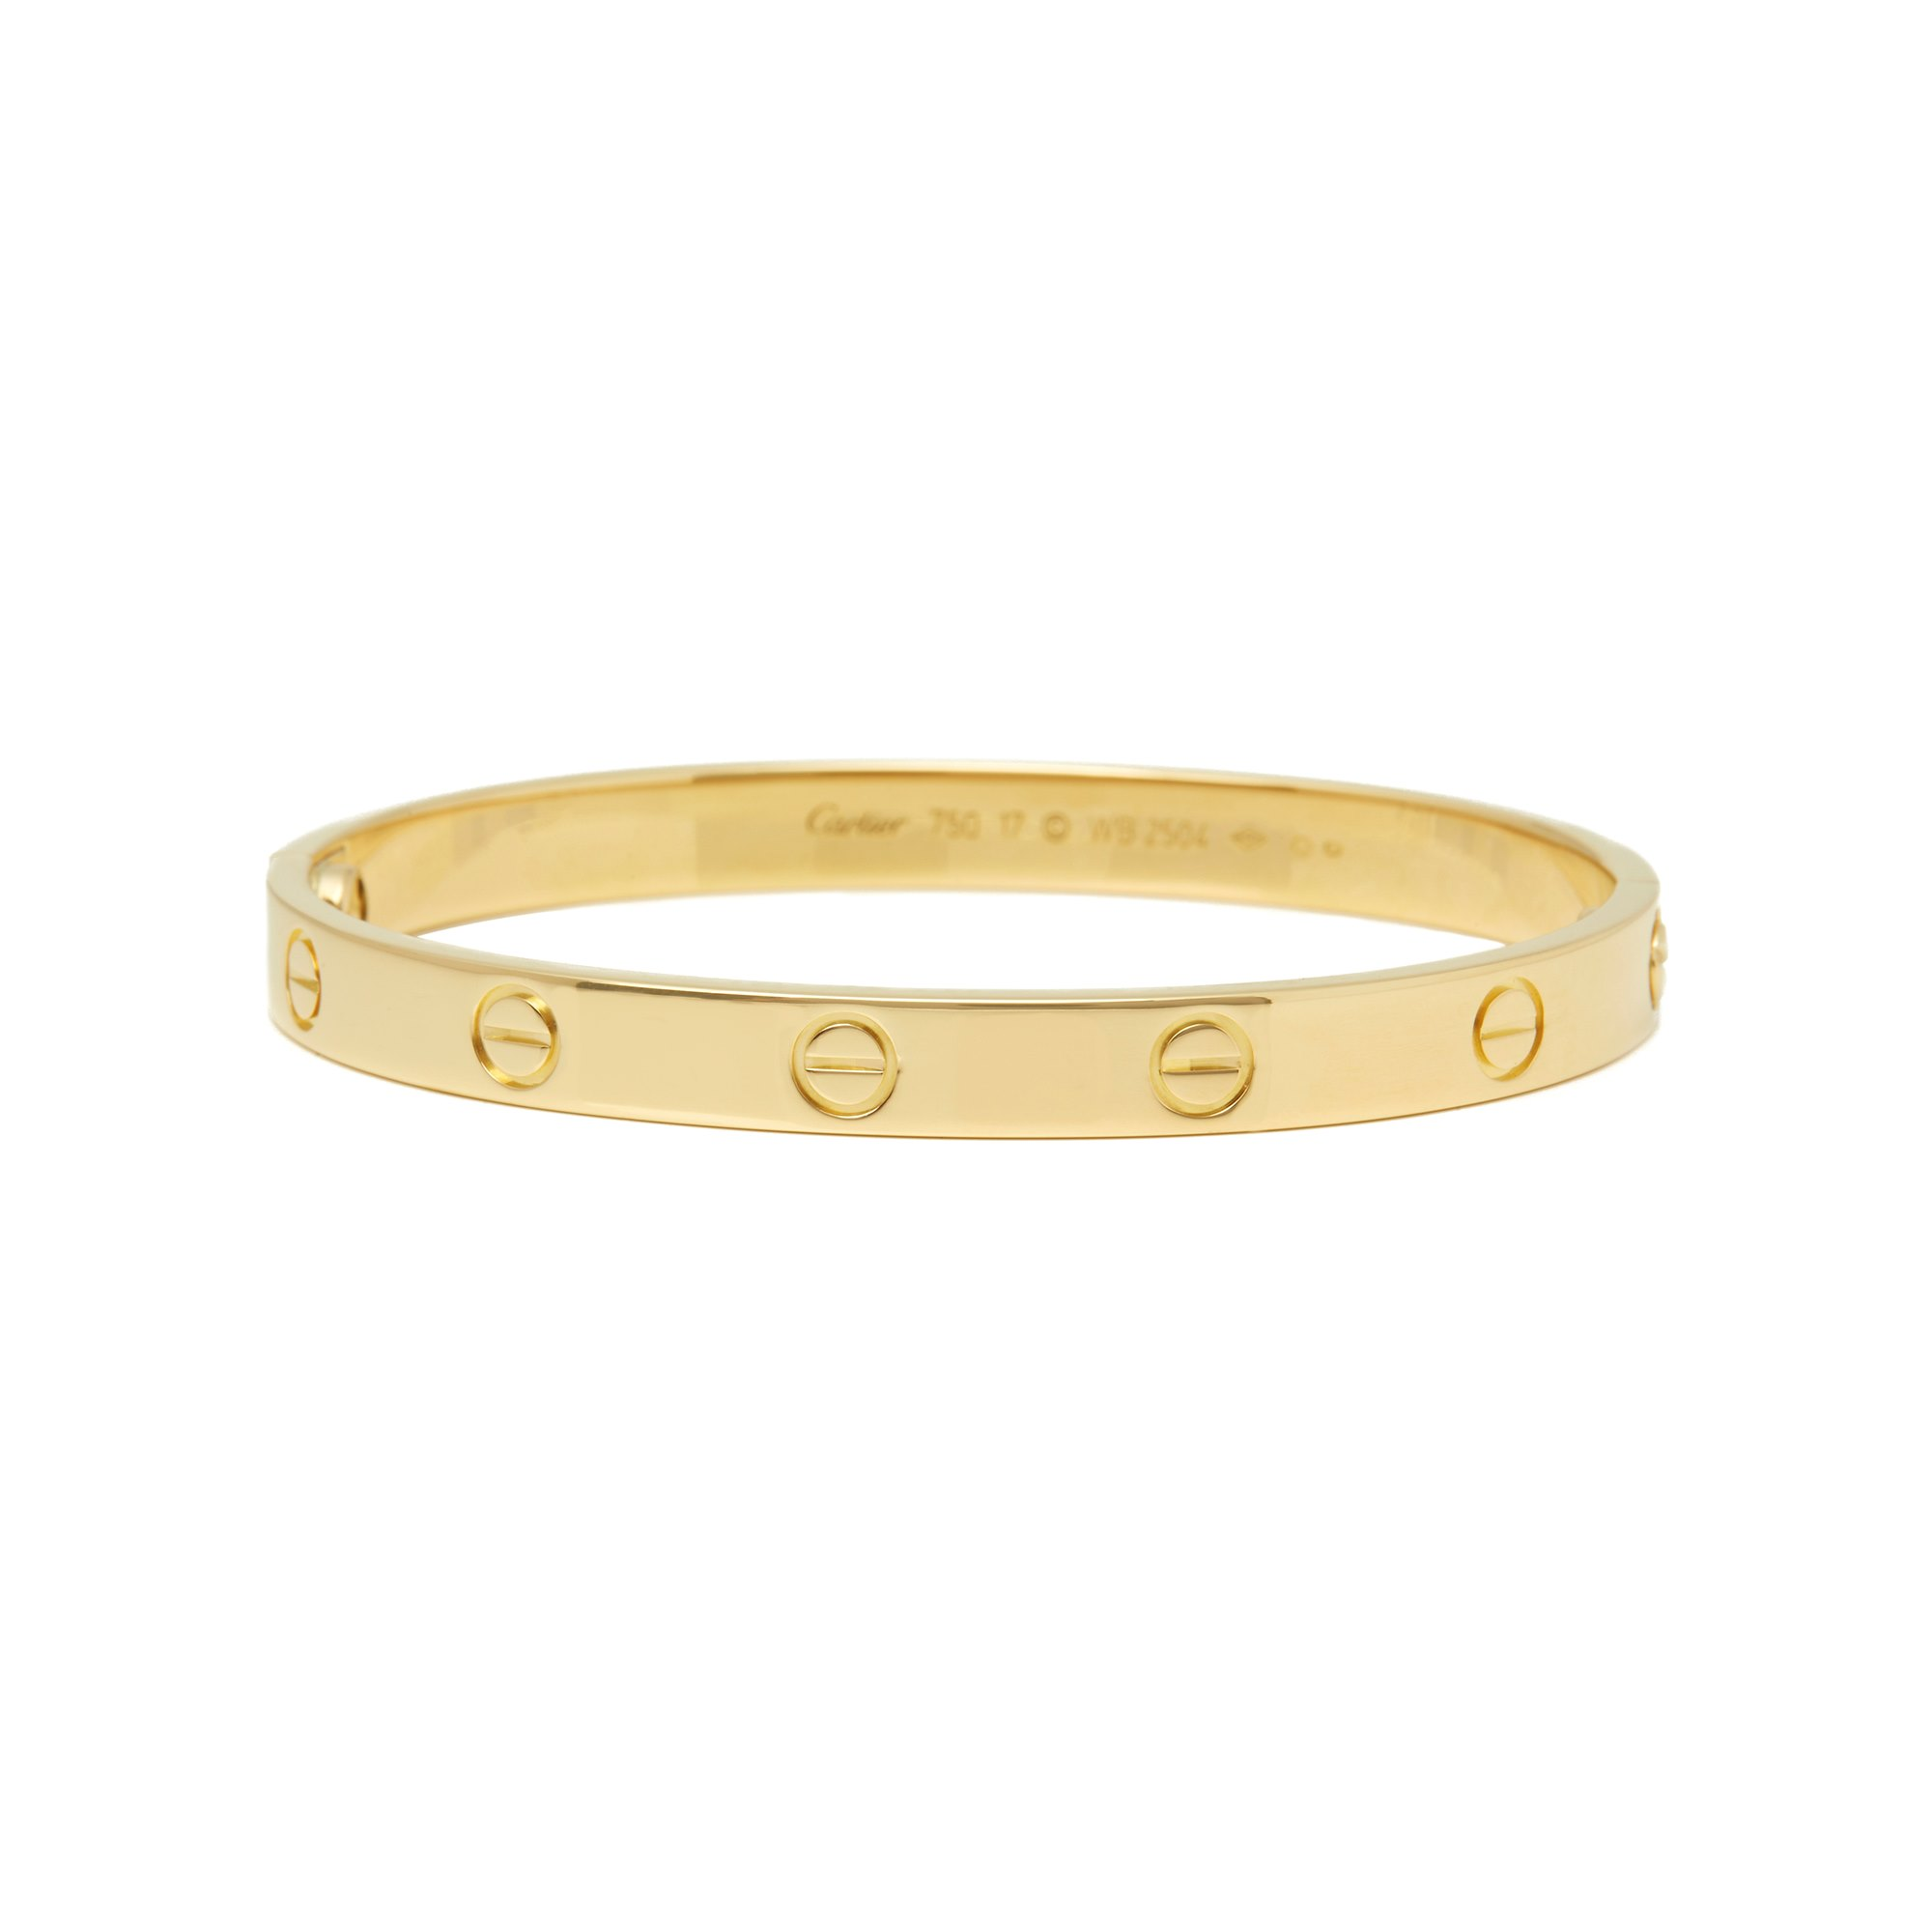 Cartier 18k Yellow Gold Love Bangle Size 17